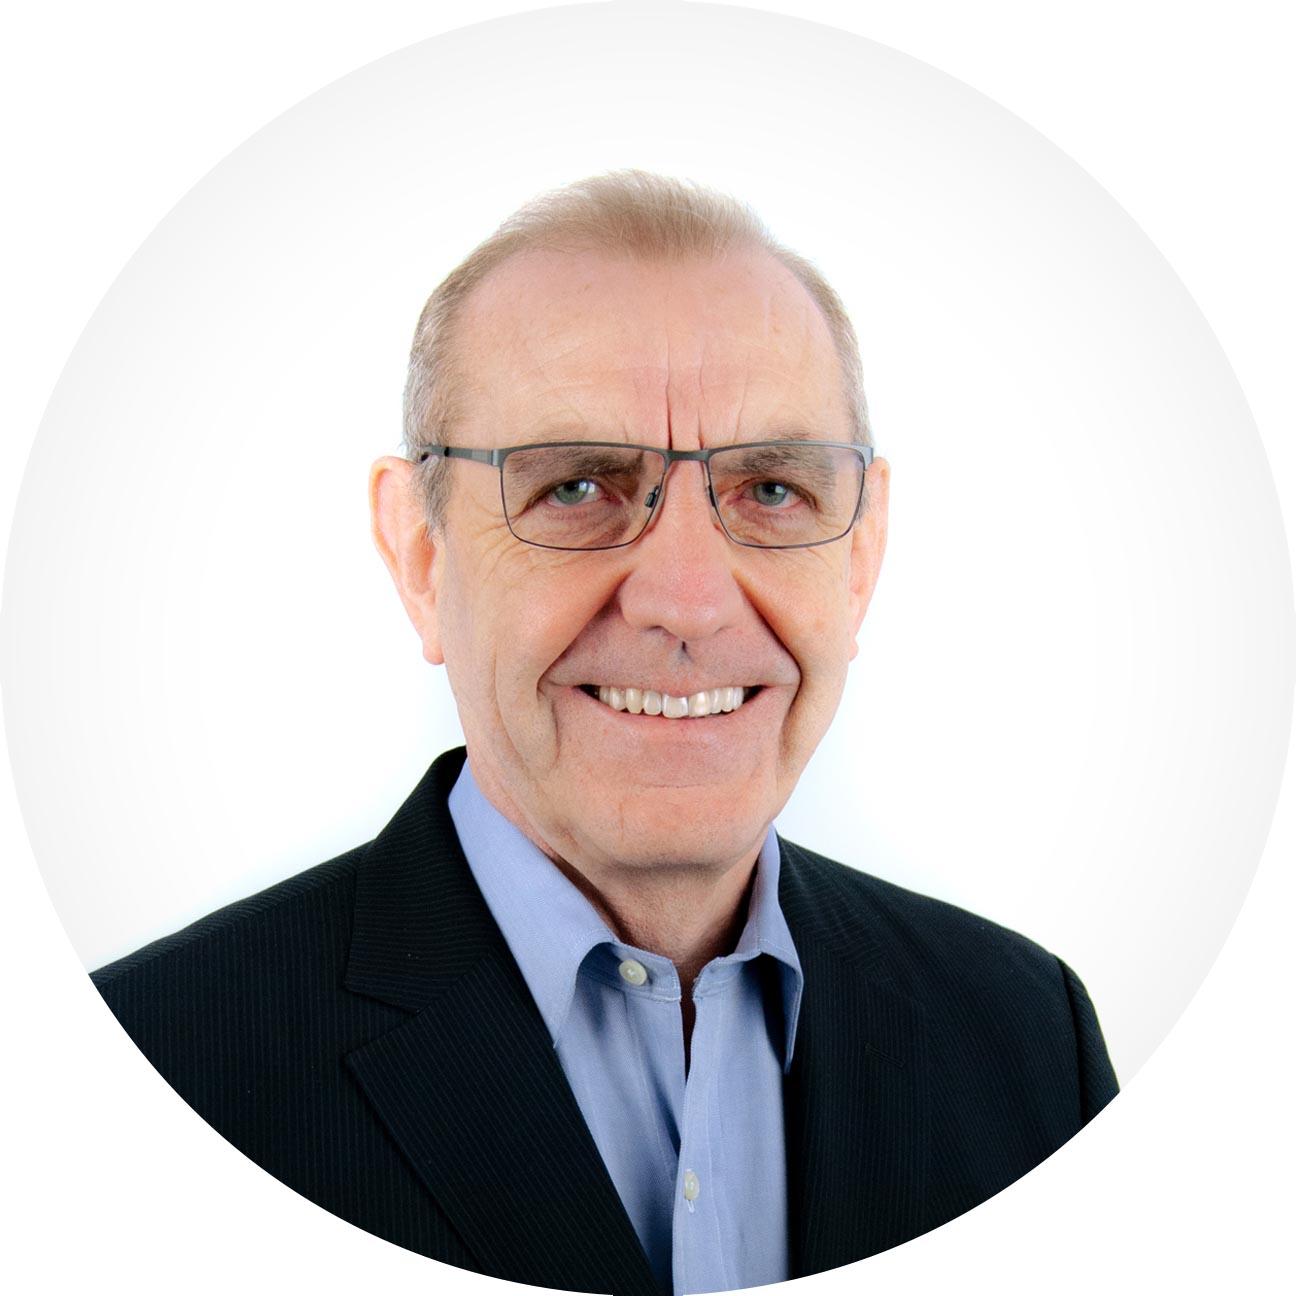 James S. Shannon, MD, MRCP (UK)